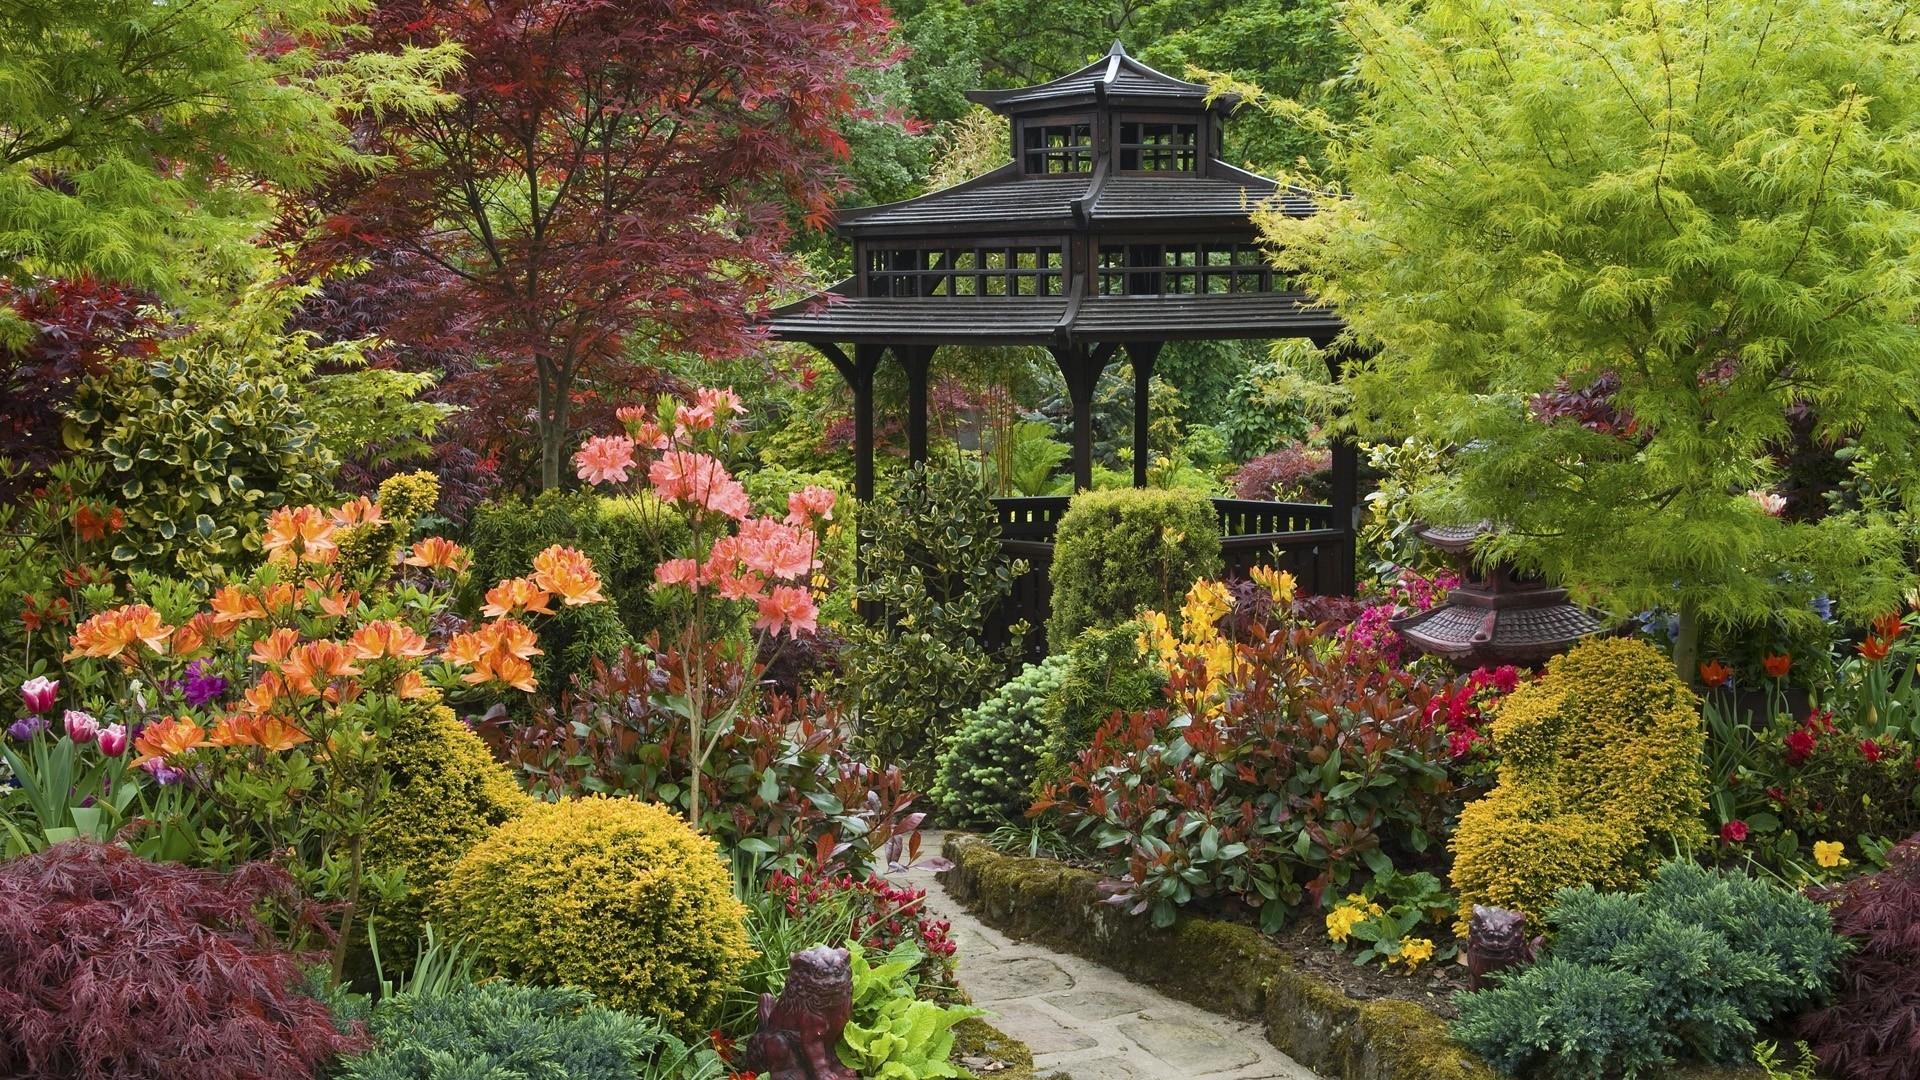 10 Best Zen Garden Wallpaper Hd FULL HD 1080p For PC Background 2018 Free Download Wonderful